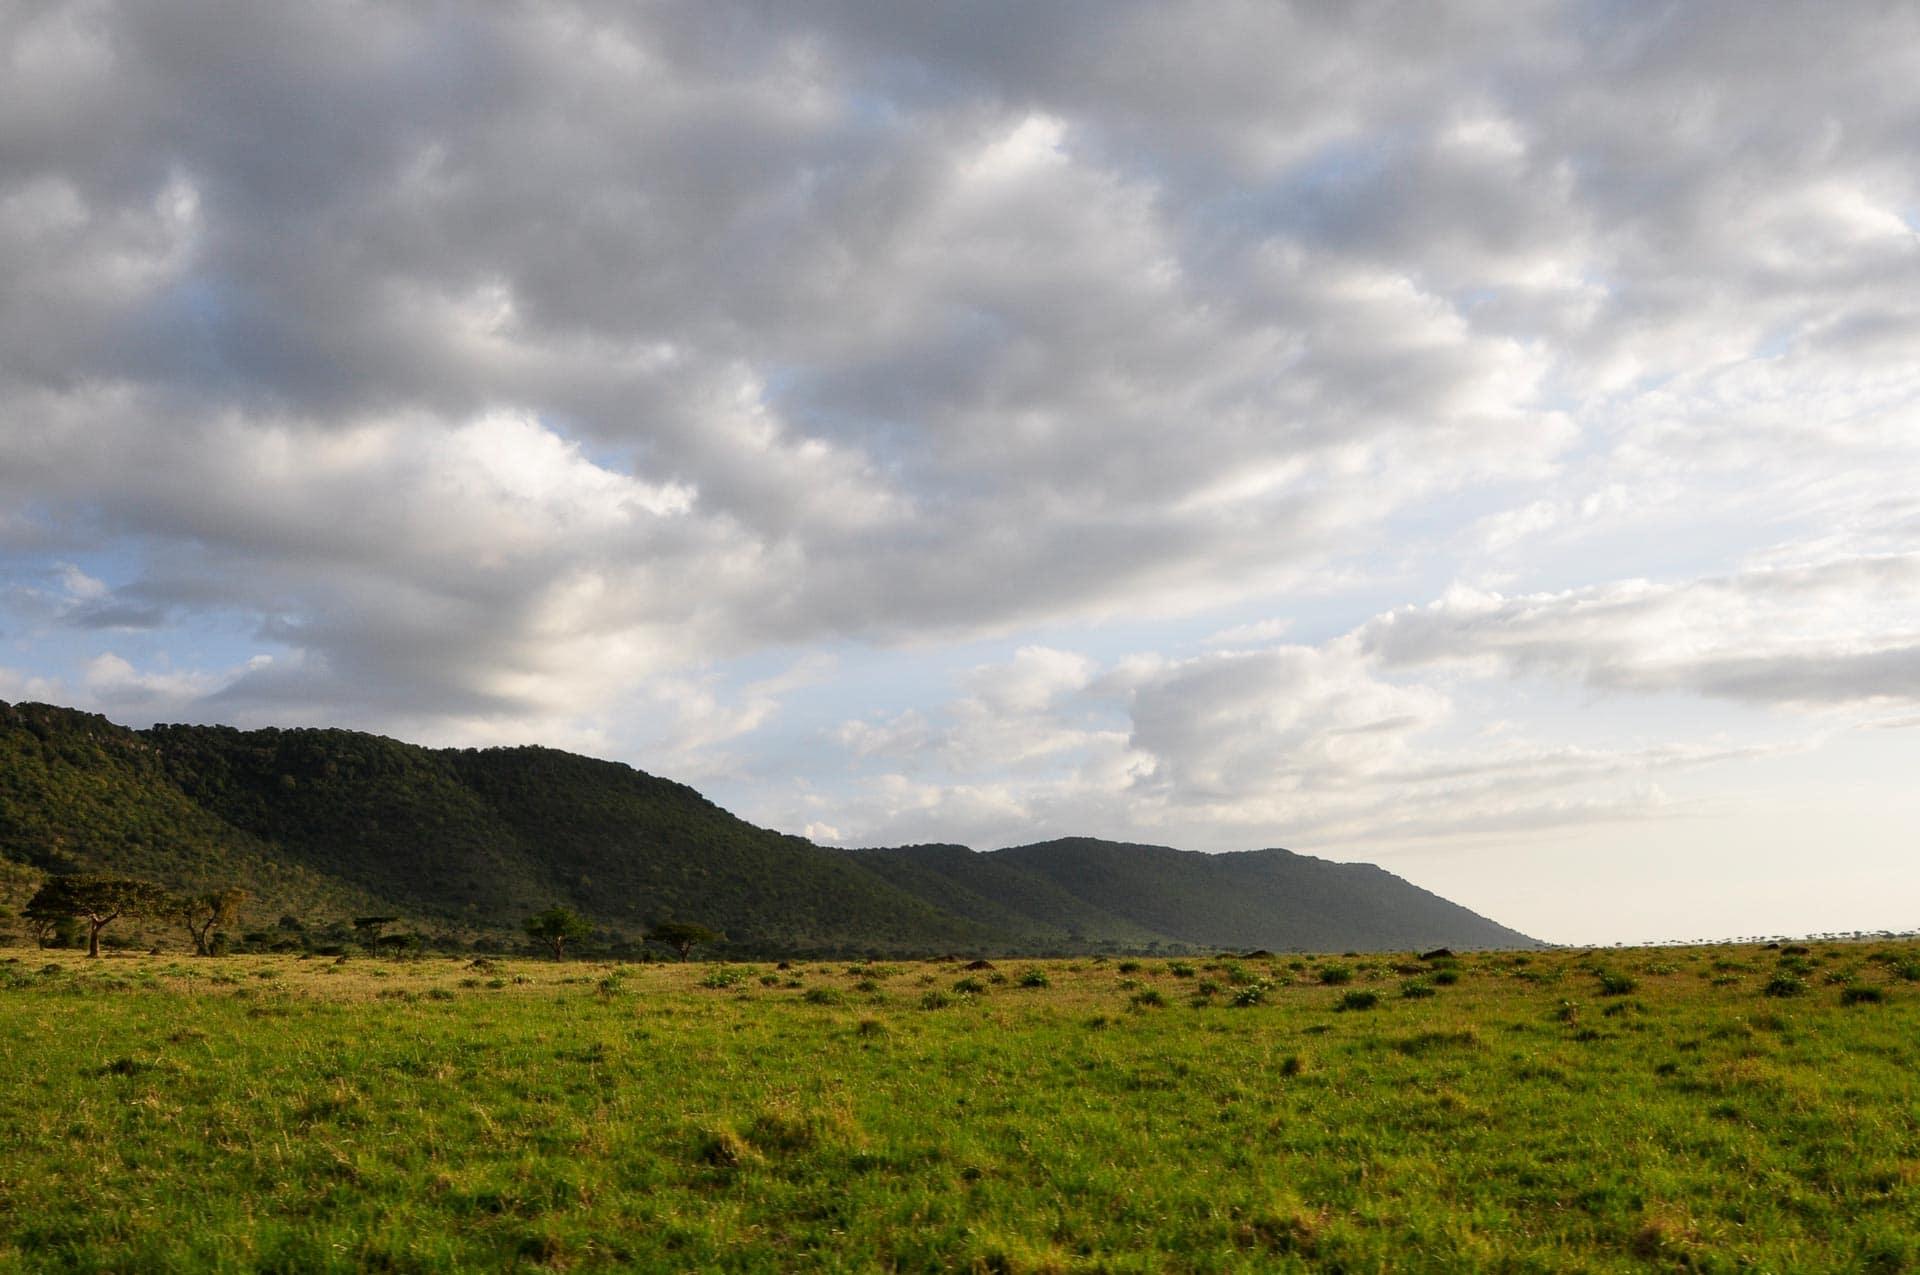 Masai-Mara-Kenia-Globetrotter-Select-25